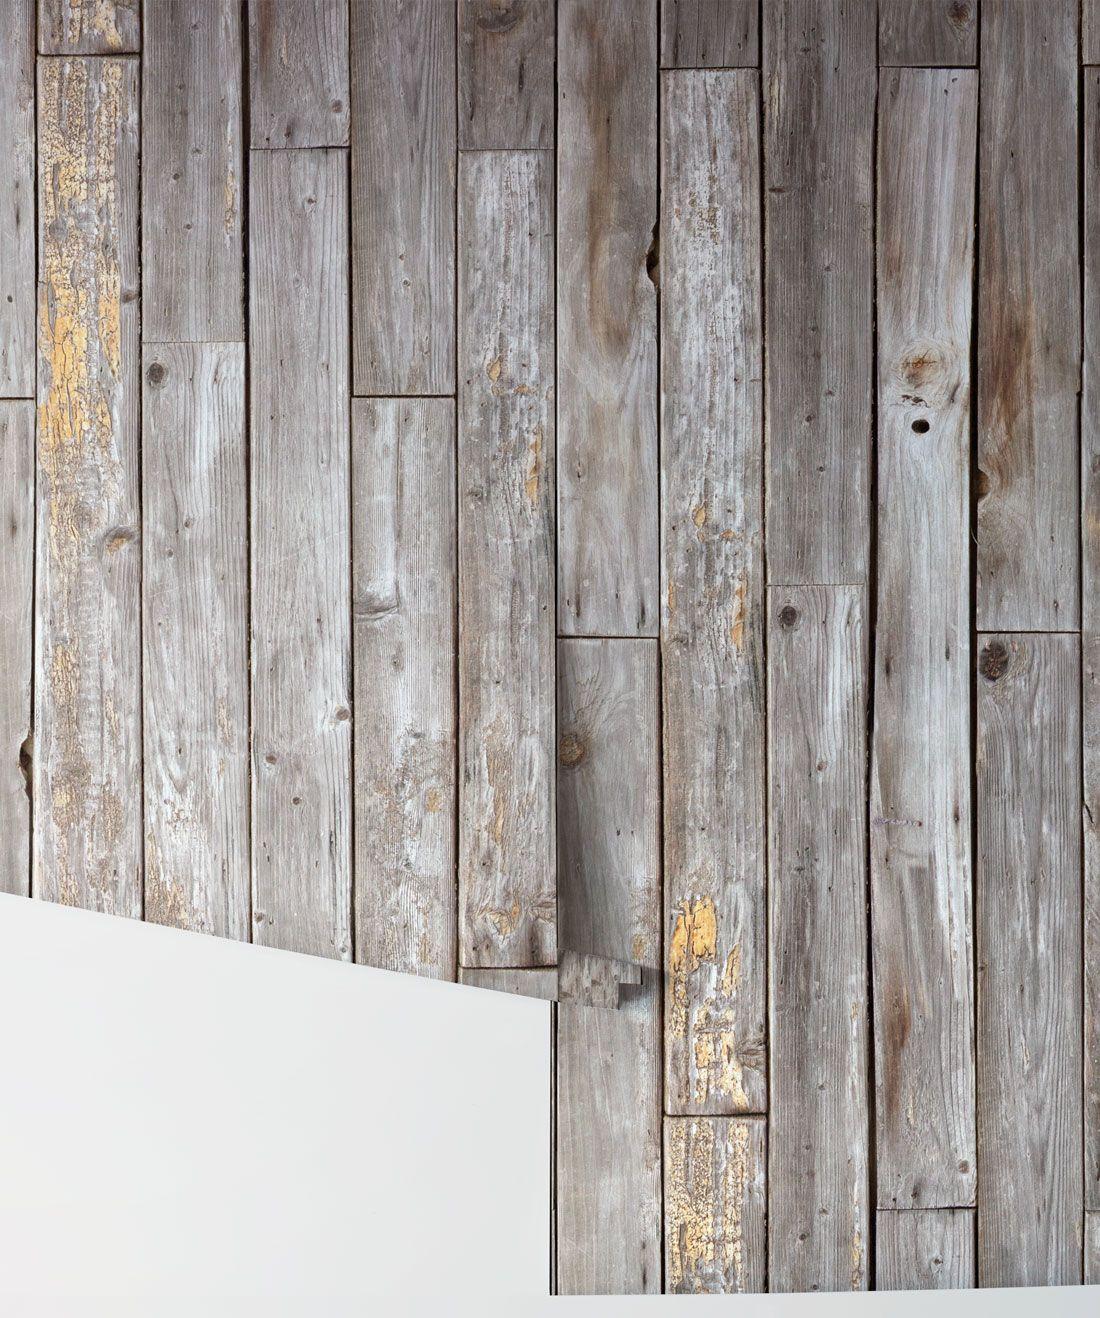 Rustic Wood Panels Wallpaper Gray Wood Effect Milton King Faux Stone Wallpaper Wood Paneling Farmhouse Wallpaper